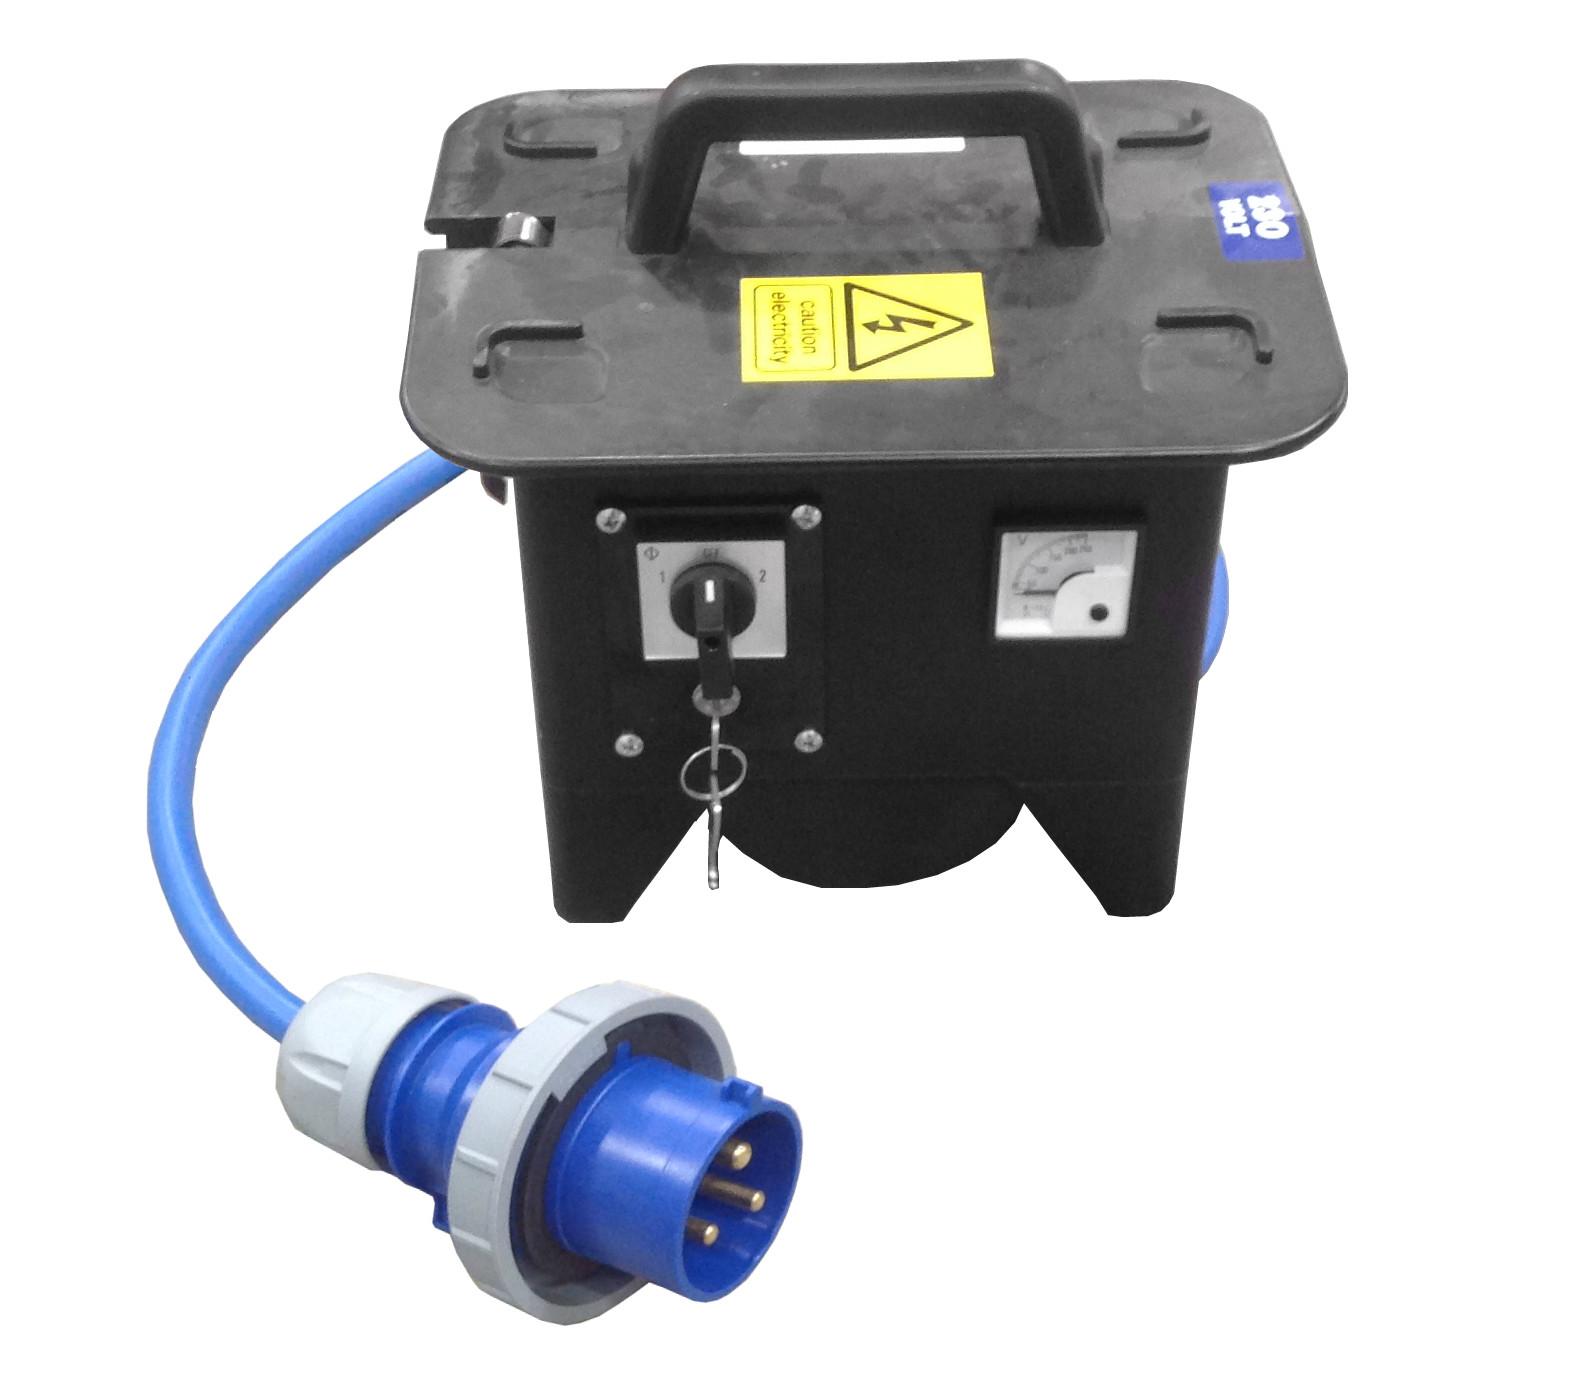 RCCB Safety Kit Box 230V for Leister Welding Machines